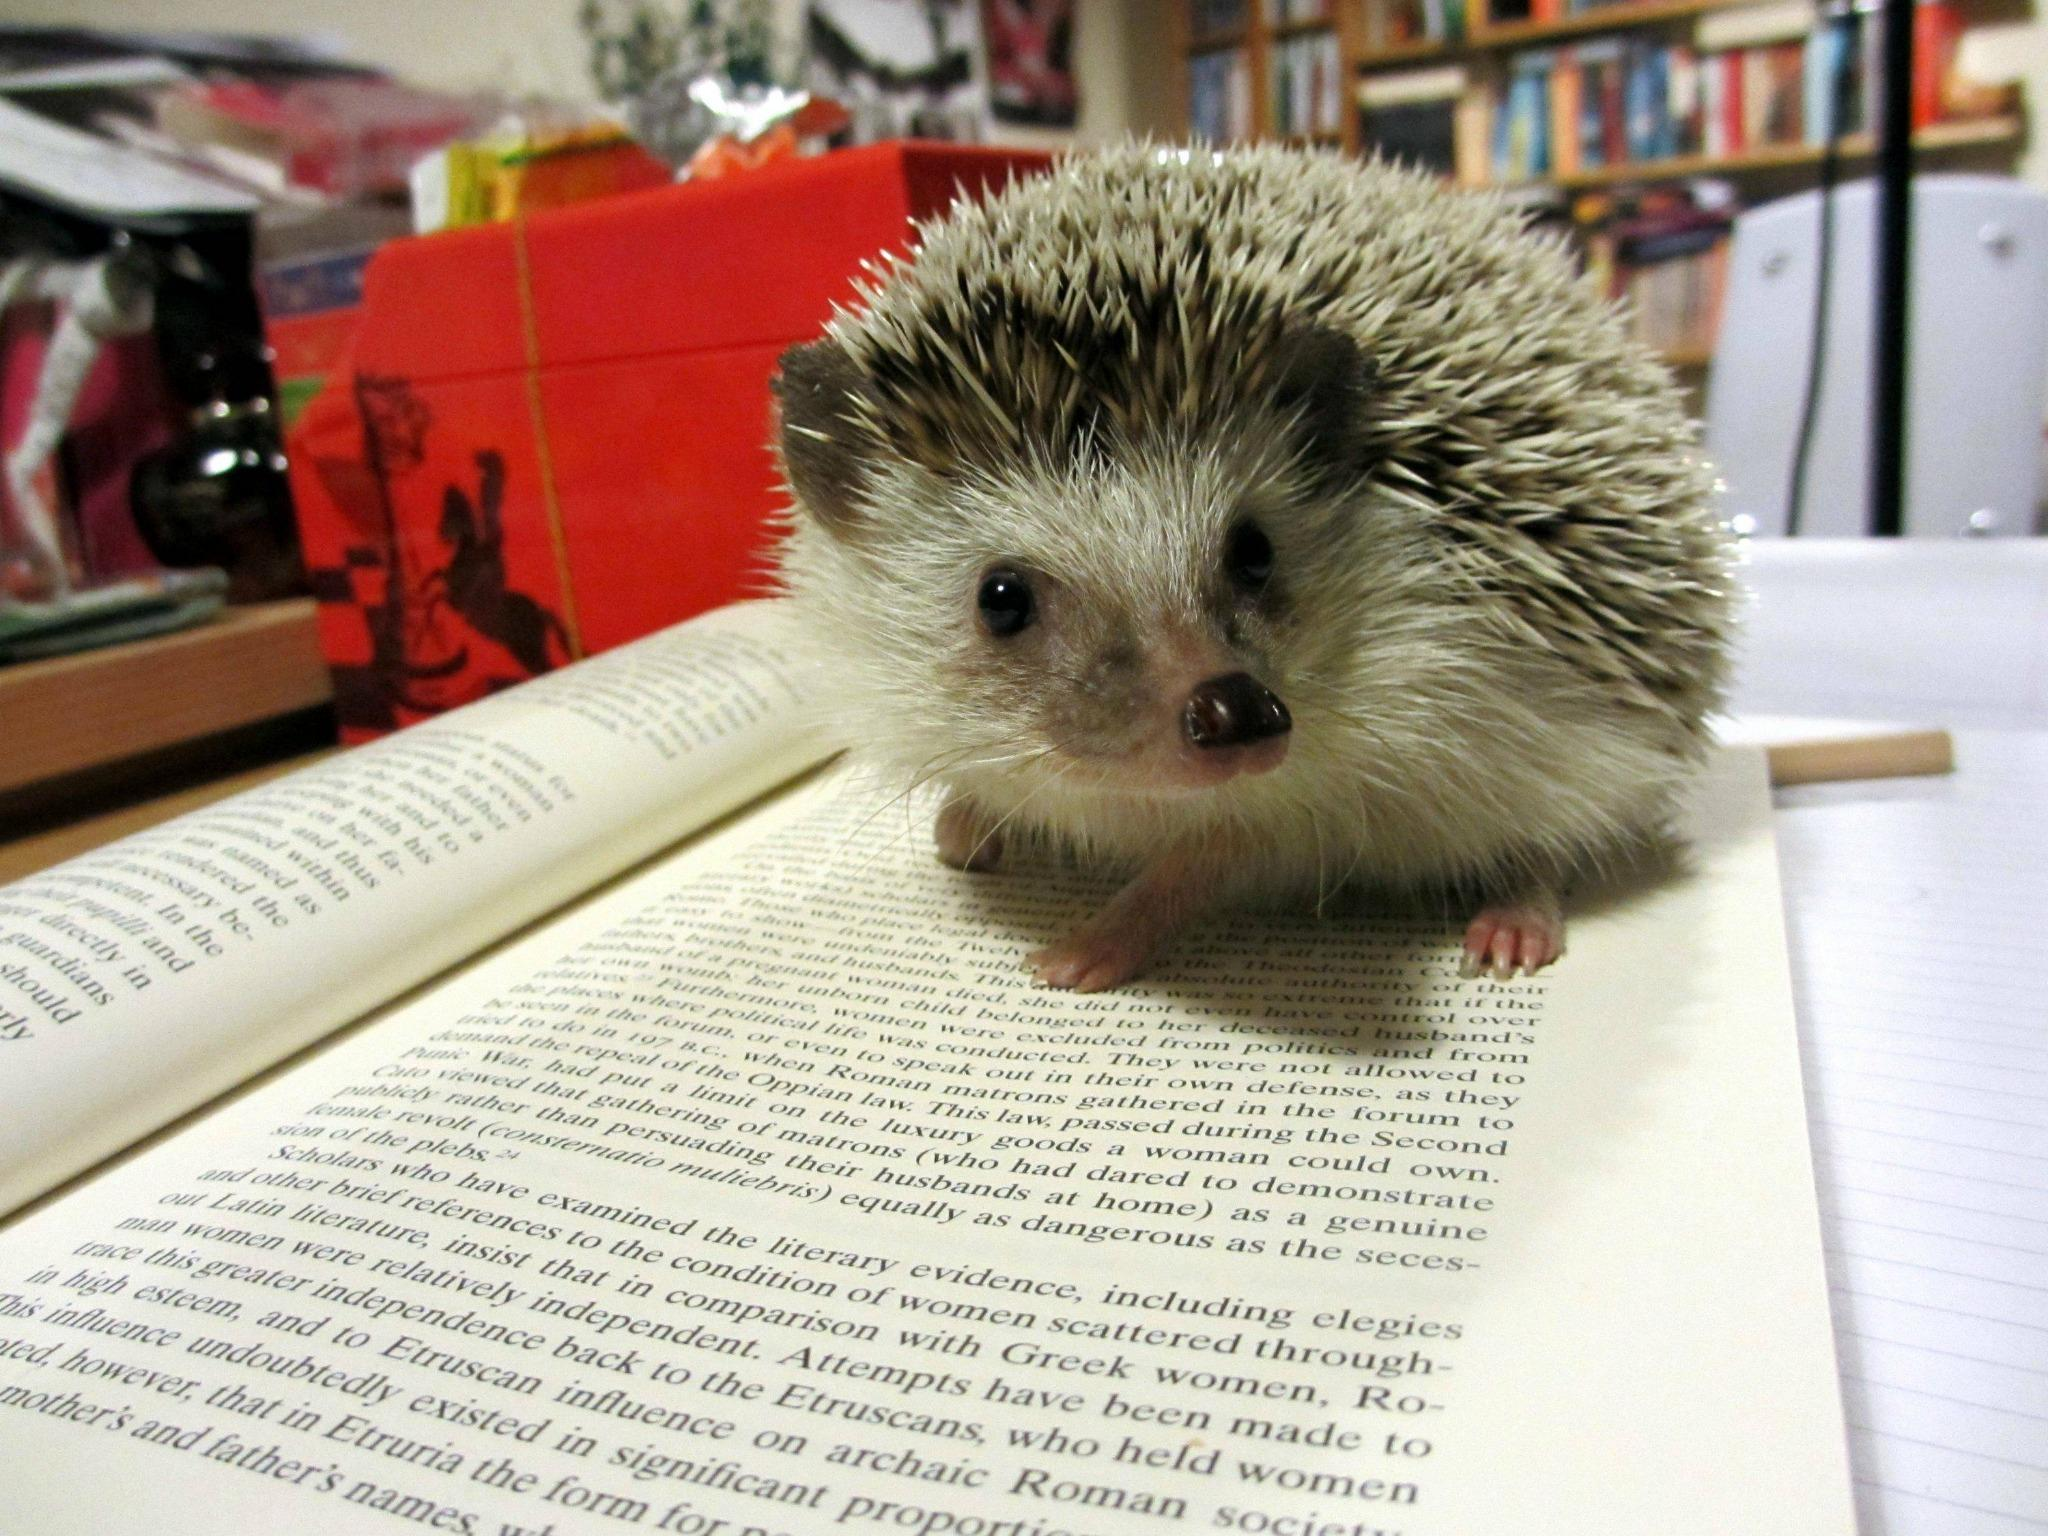 Hedgehog, studying for finals. http://t.co/EhQ2tLiU